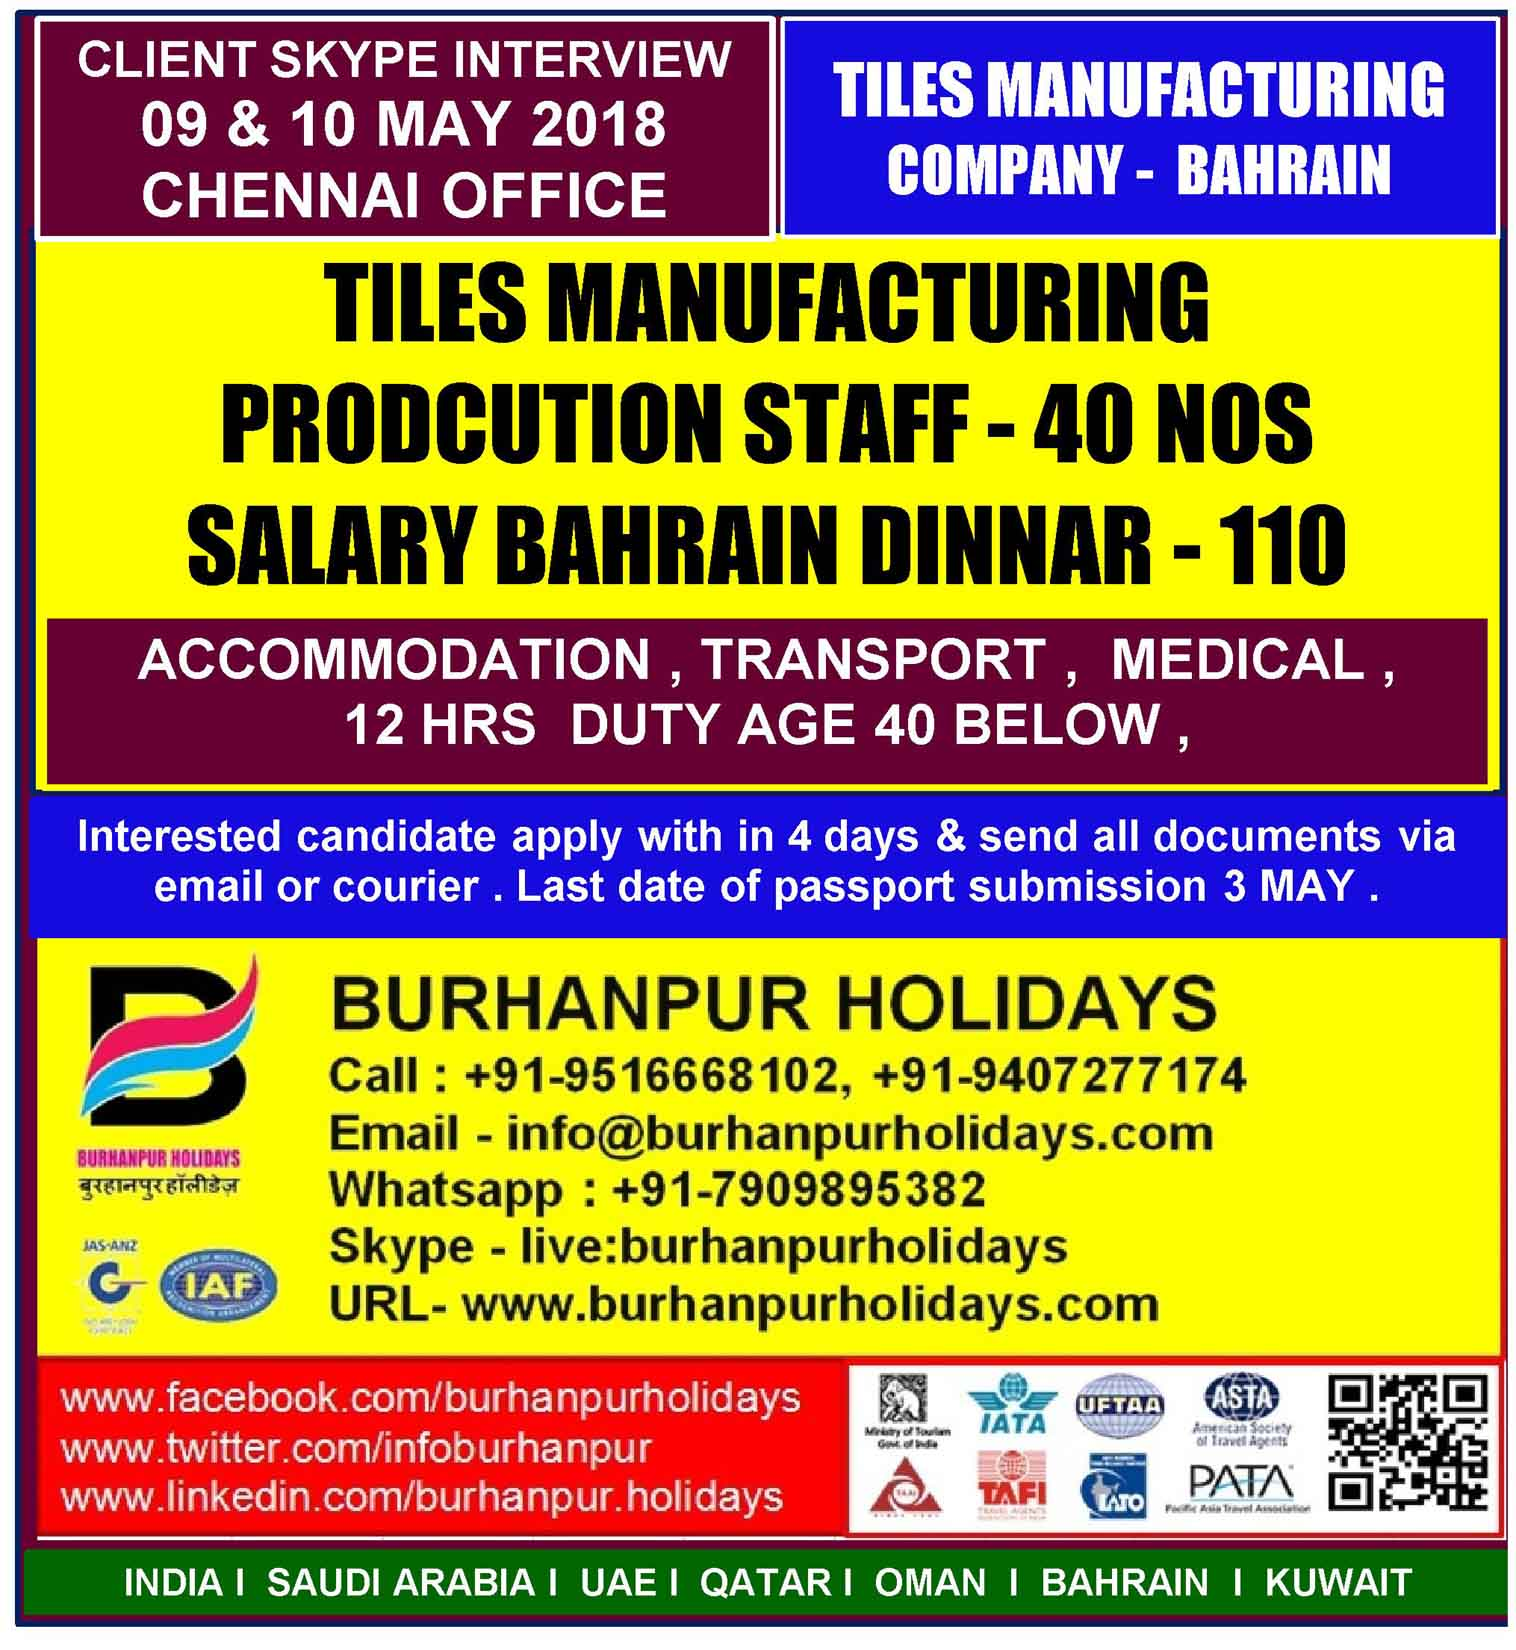 TILES MANUFACTURING COMPANY - BAHRAIN